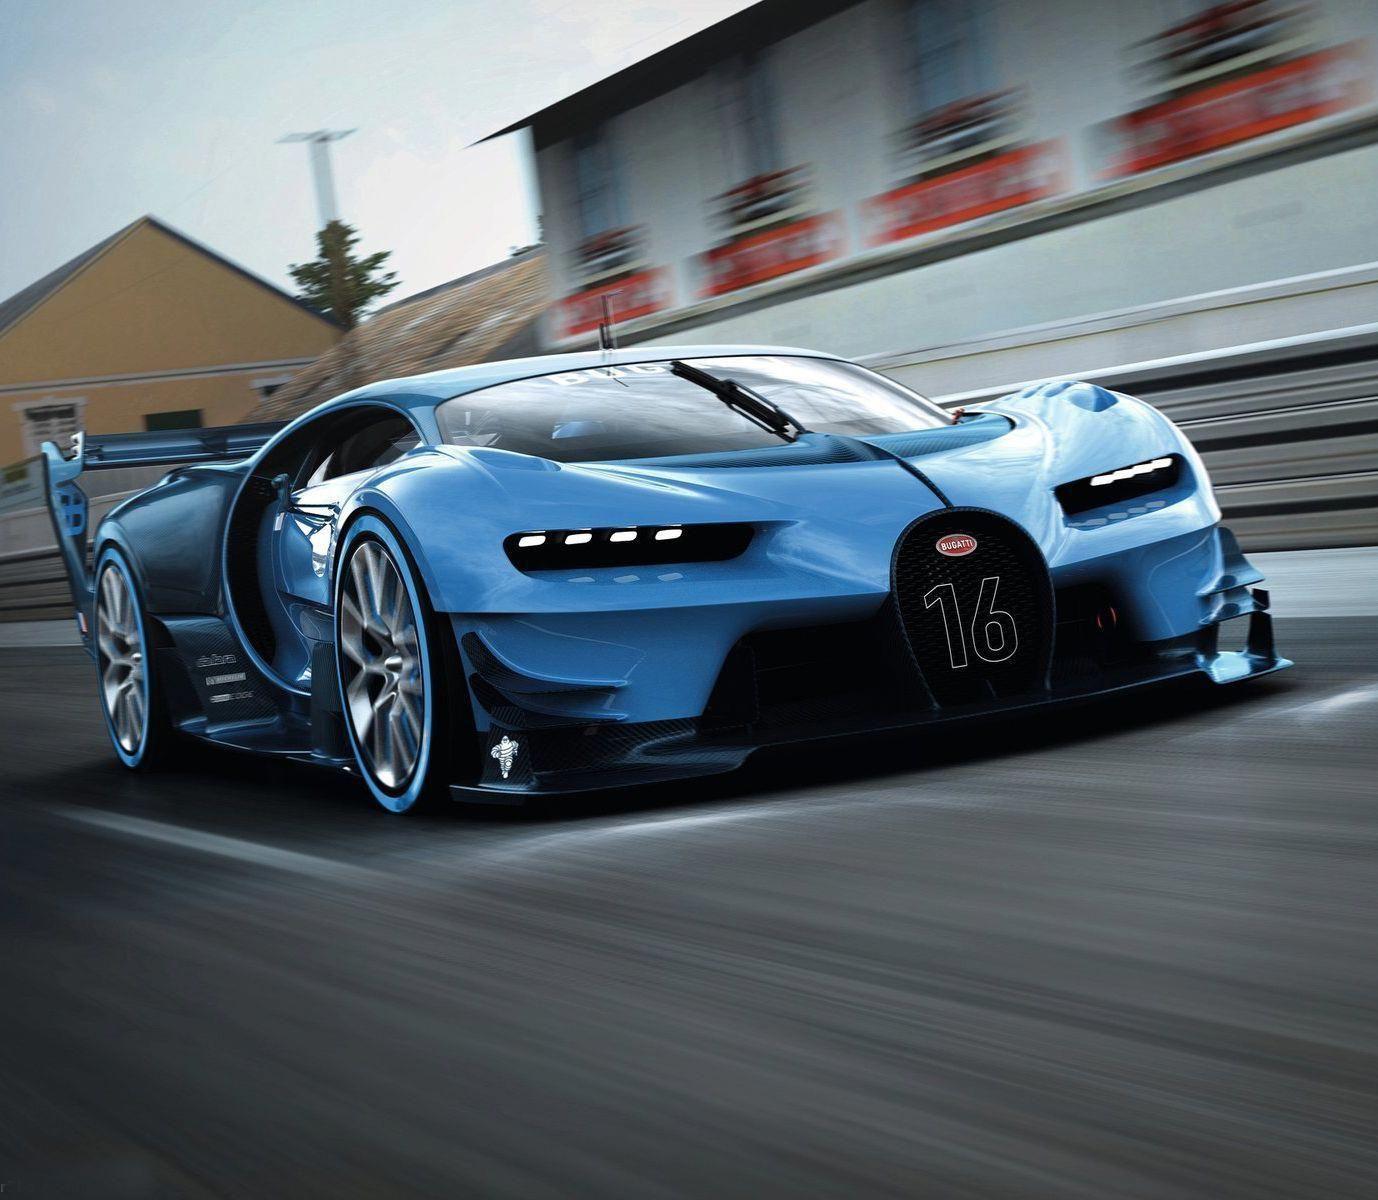 Chiron Super Sport Speedster Looks Like The Veyron: Bugatti Vision GT Rear. #bugattieb110